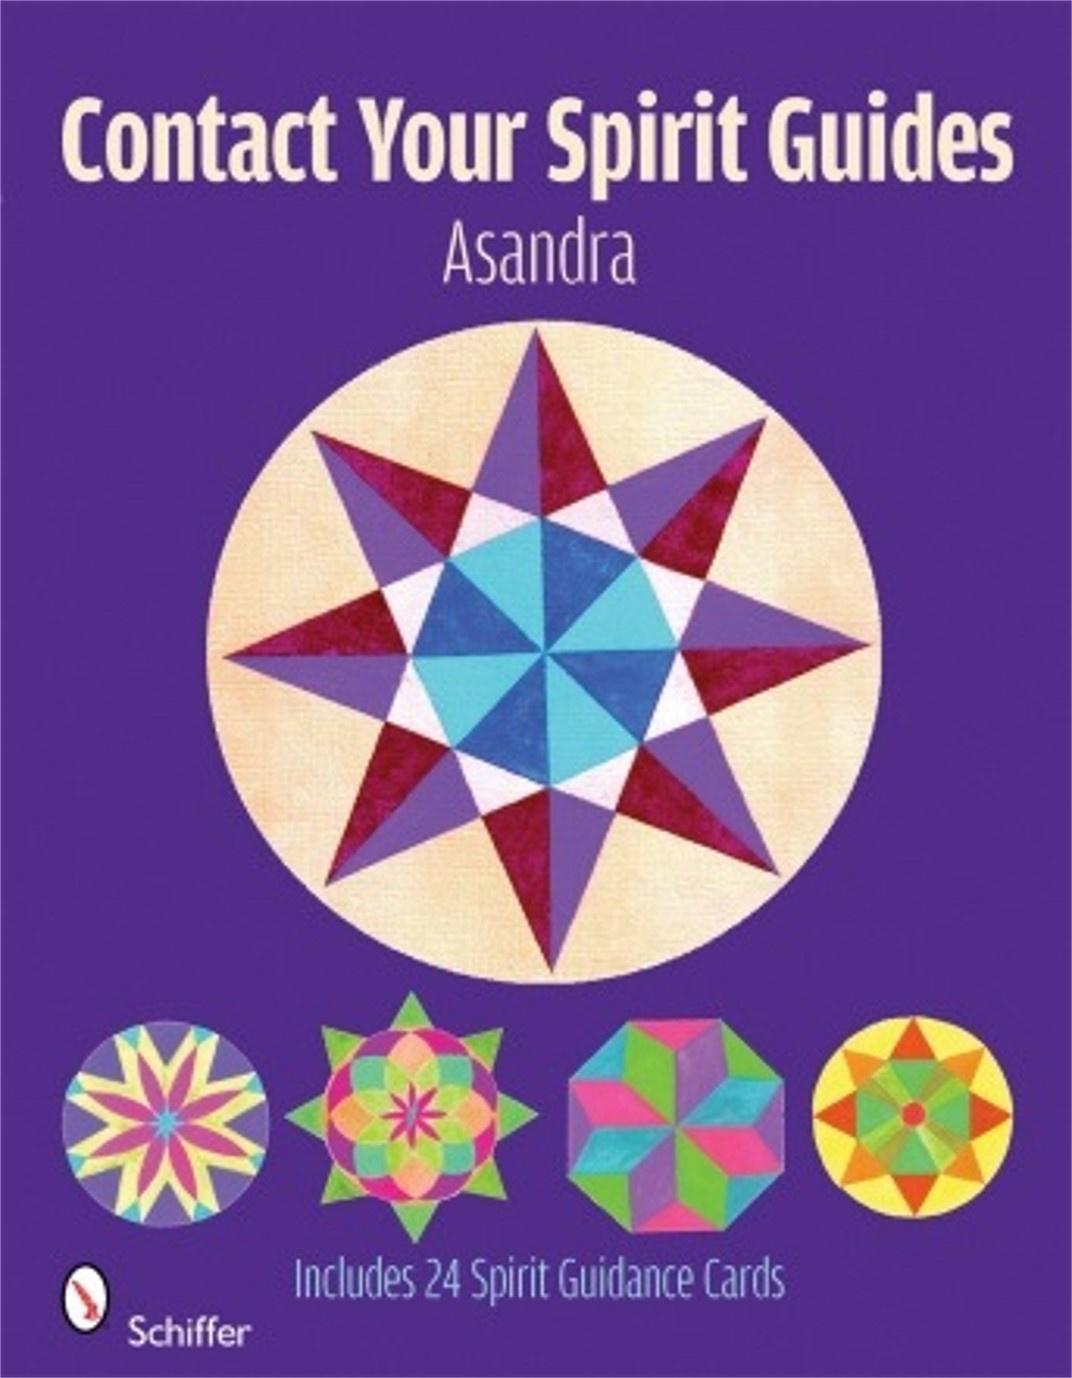 CONTACT_SPIRIT_GUIDE-F_4832.jpg